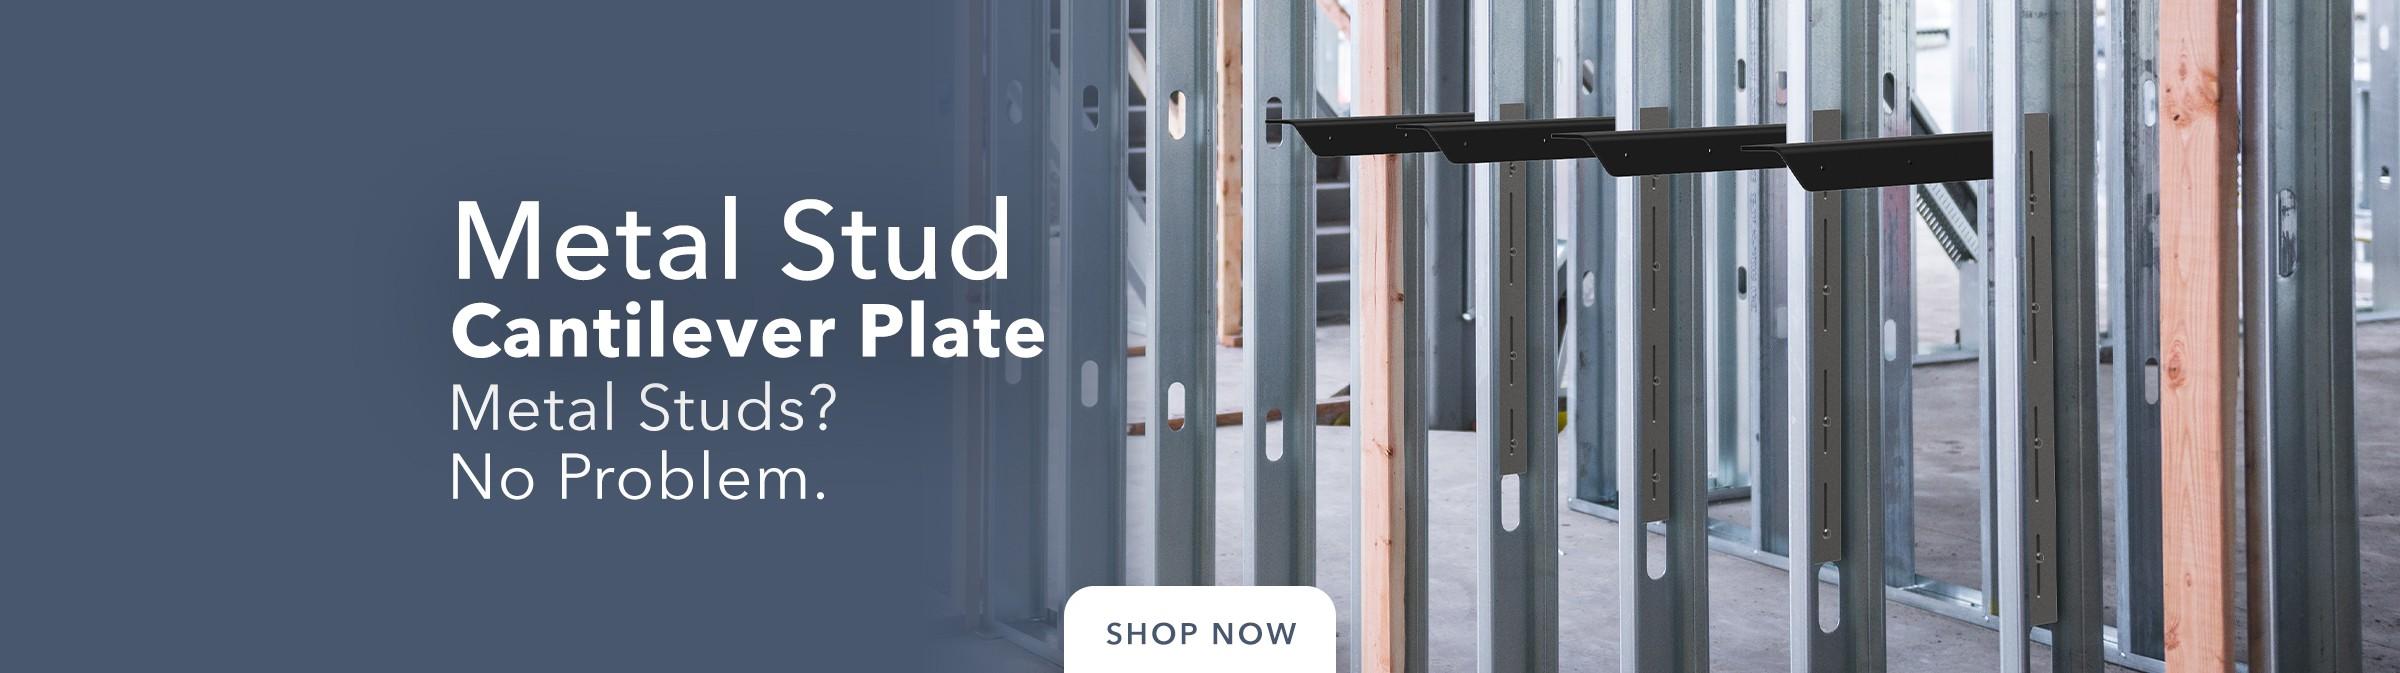 Metal Stud Cantilever Plate